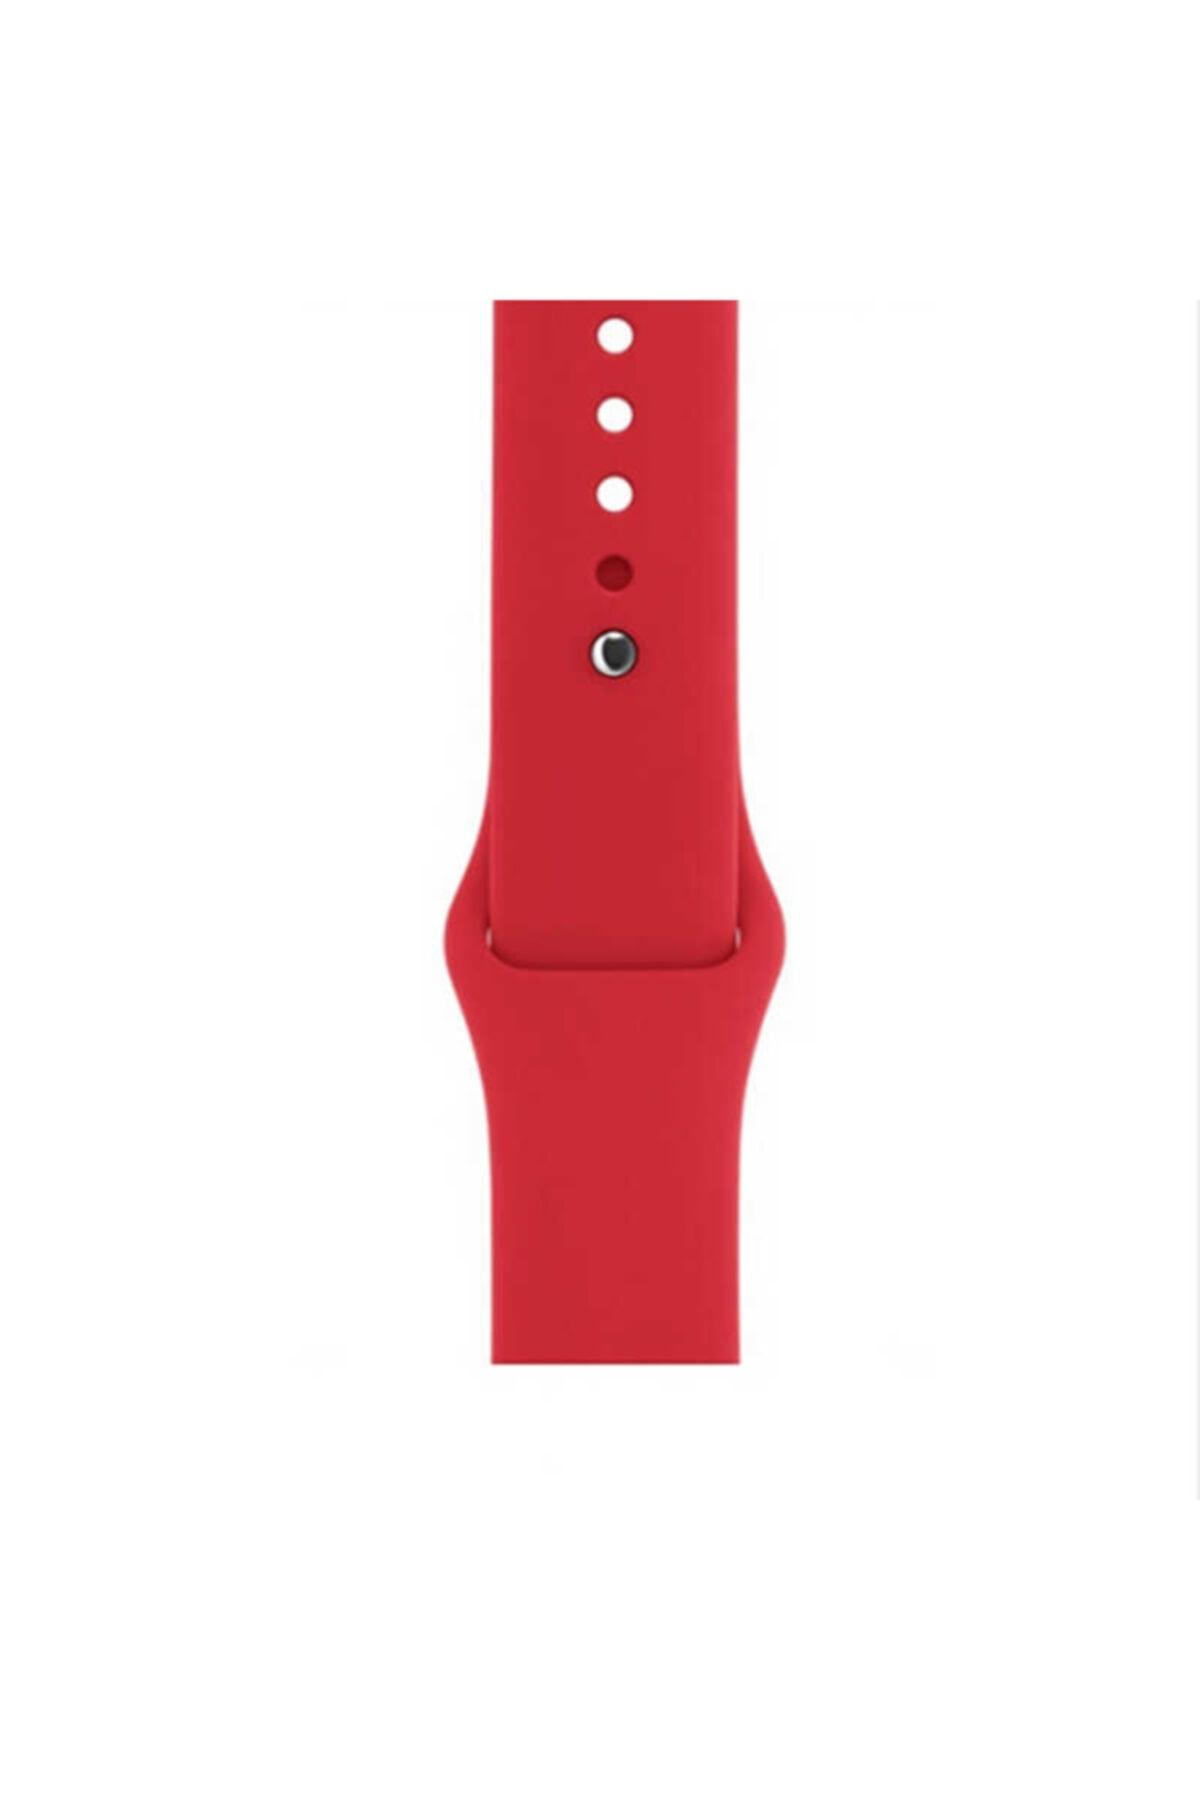 zore Apple Watch 1 2 3 4 5 6 Se Serisi 44mm Kordon Spor Silikon Mat Renkli Kayış 1